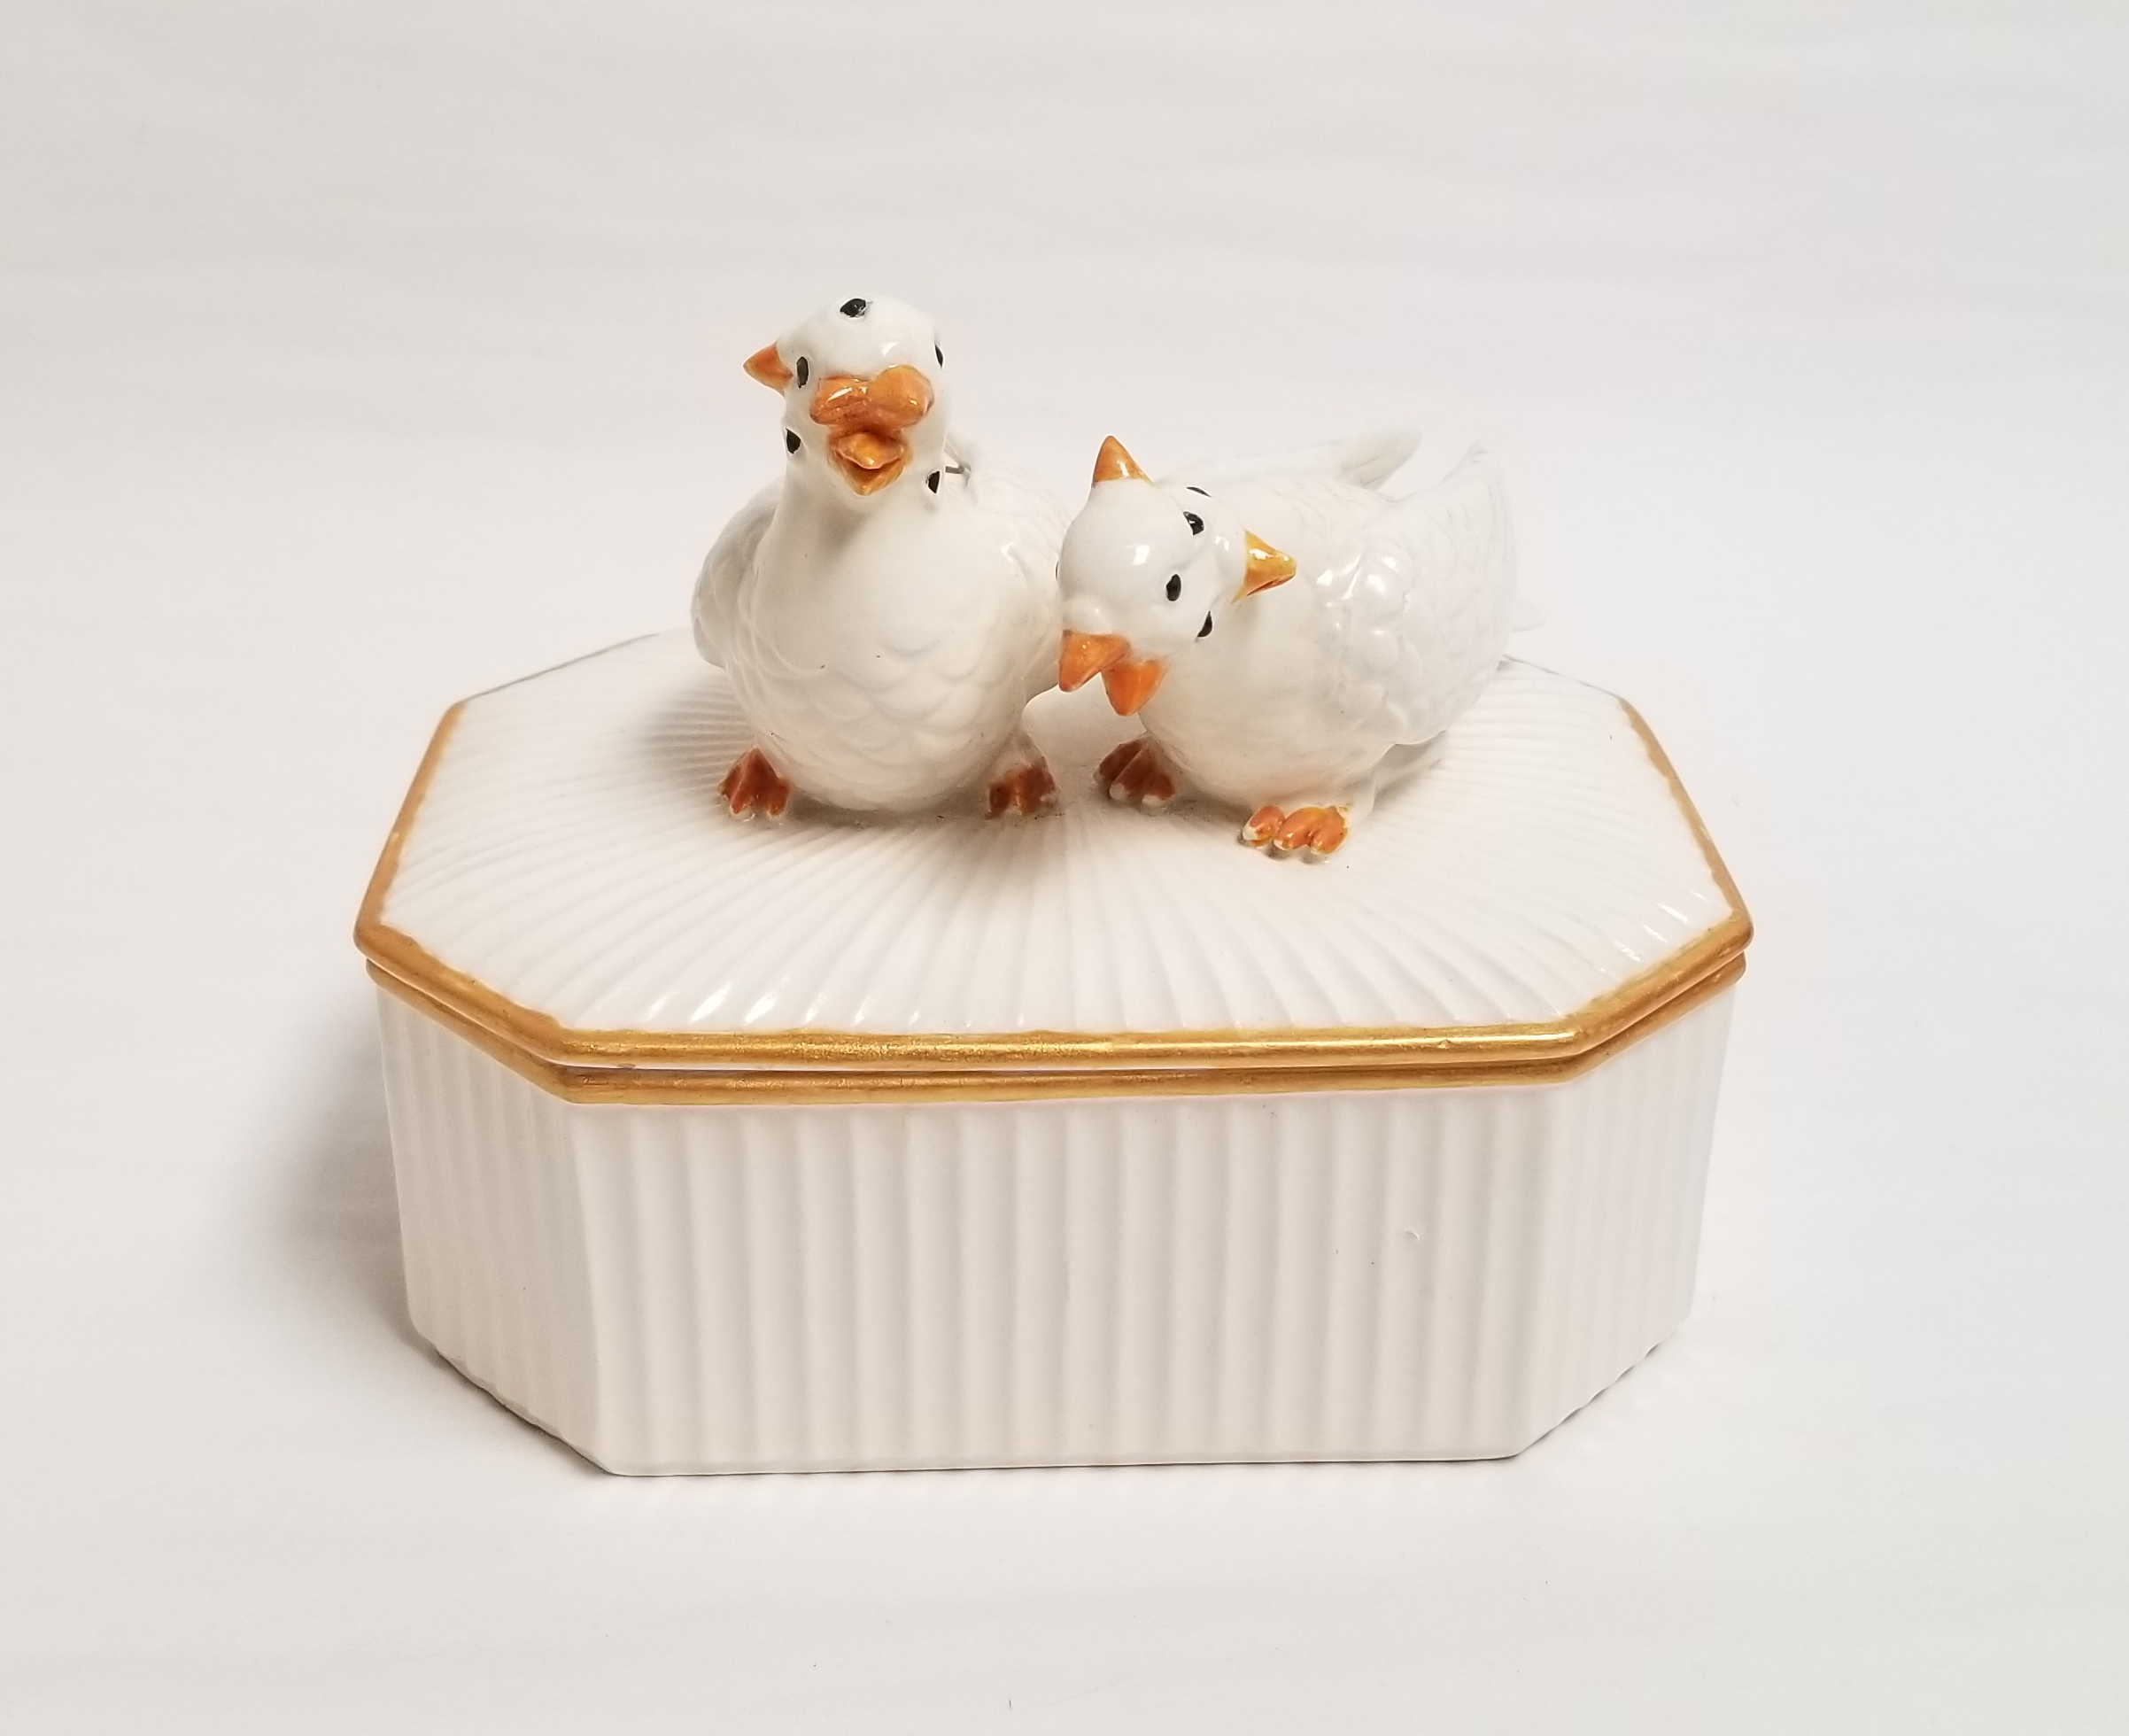 "Debra Broz, Many-faced Doves, 2021 Mixed media on secondhand ceramic figurines 4"" x 6"" x 4"""